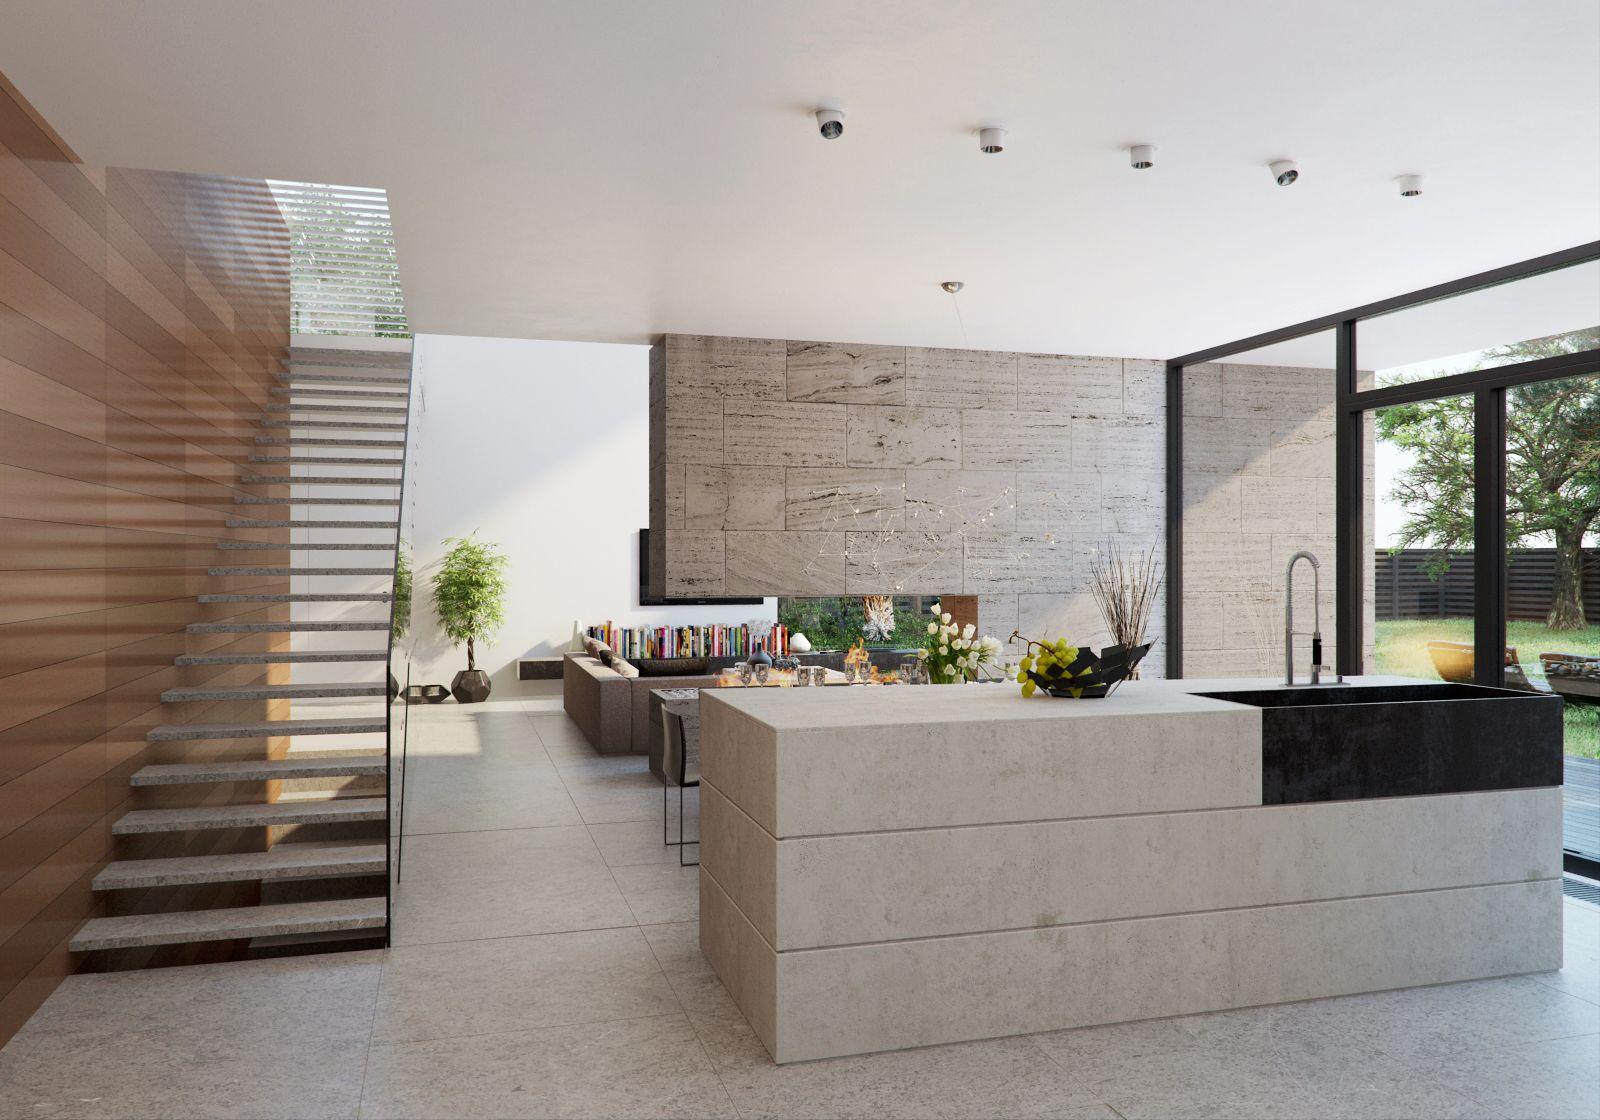 Keuken Met Trap : Mooie keuken open trap en openhaard home pinterest modernes